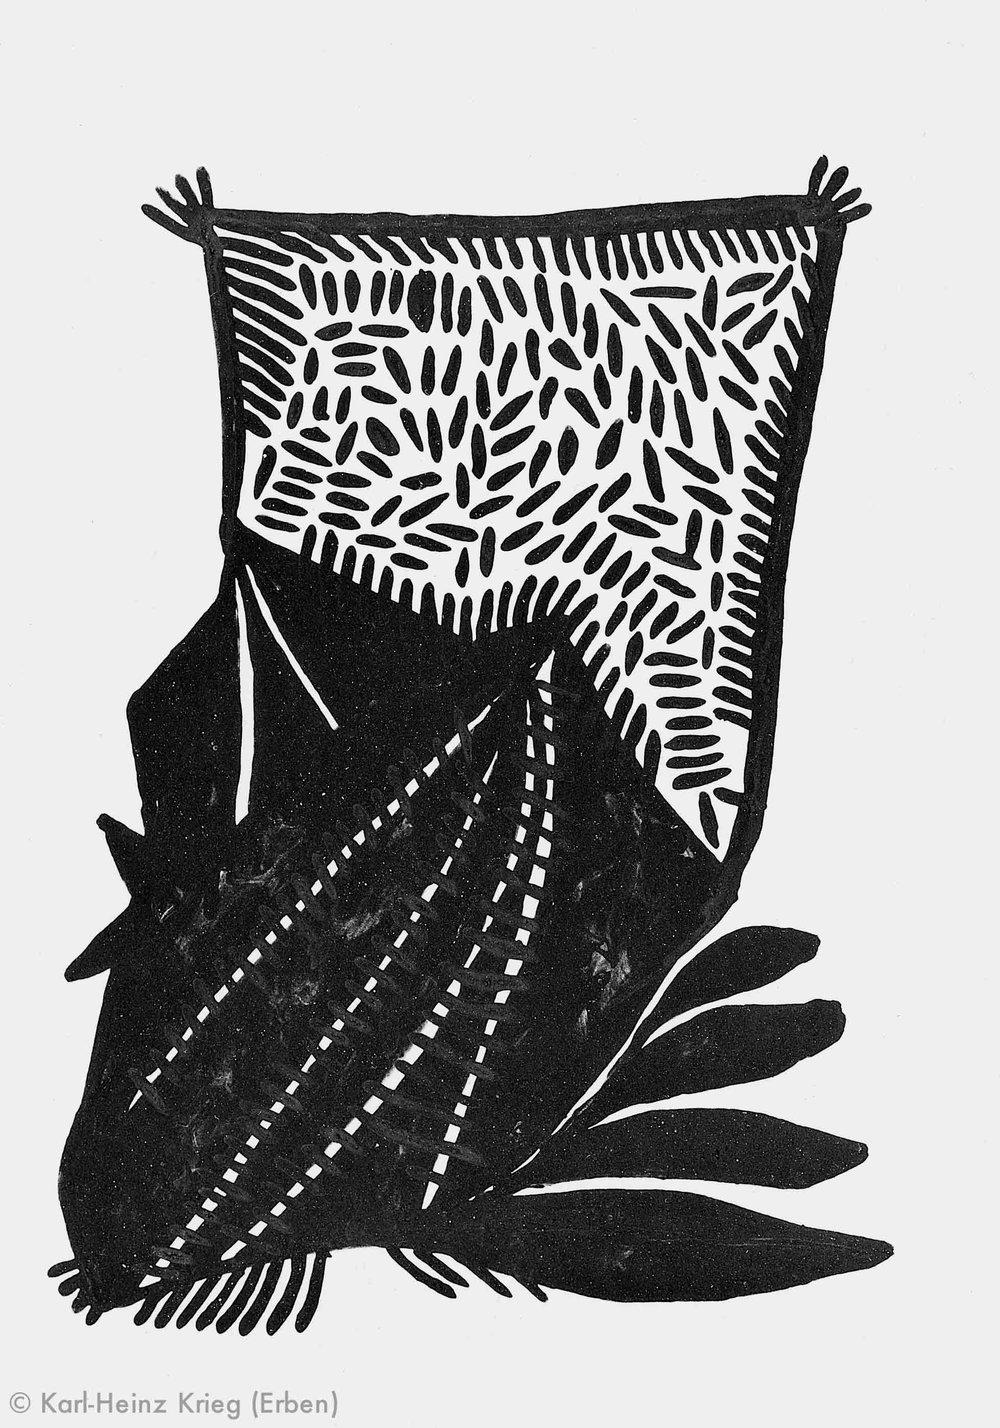 Akoi Zoumanigi Wöéngi, 1996 Acryl/Papier, grundiert 29,5 x 21 cm Werknr. 38-1996/13